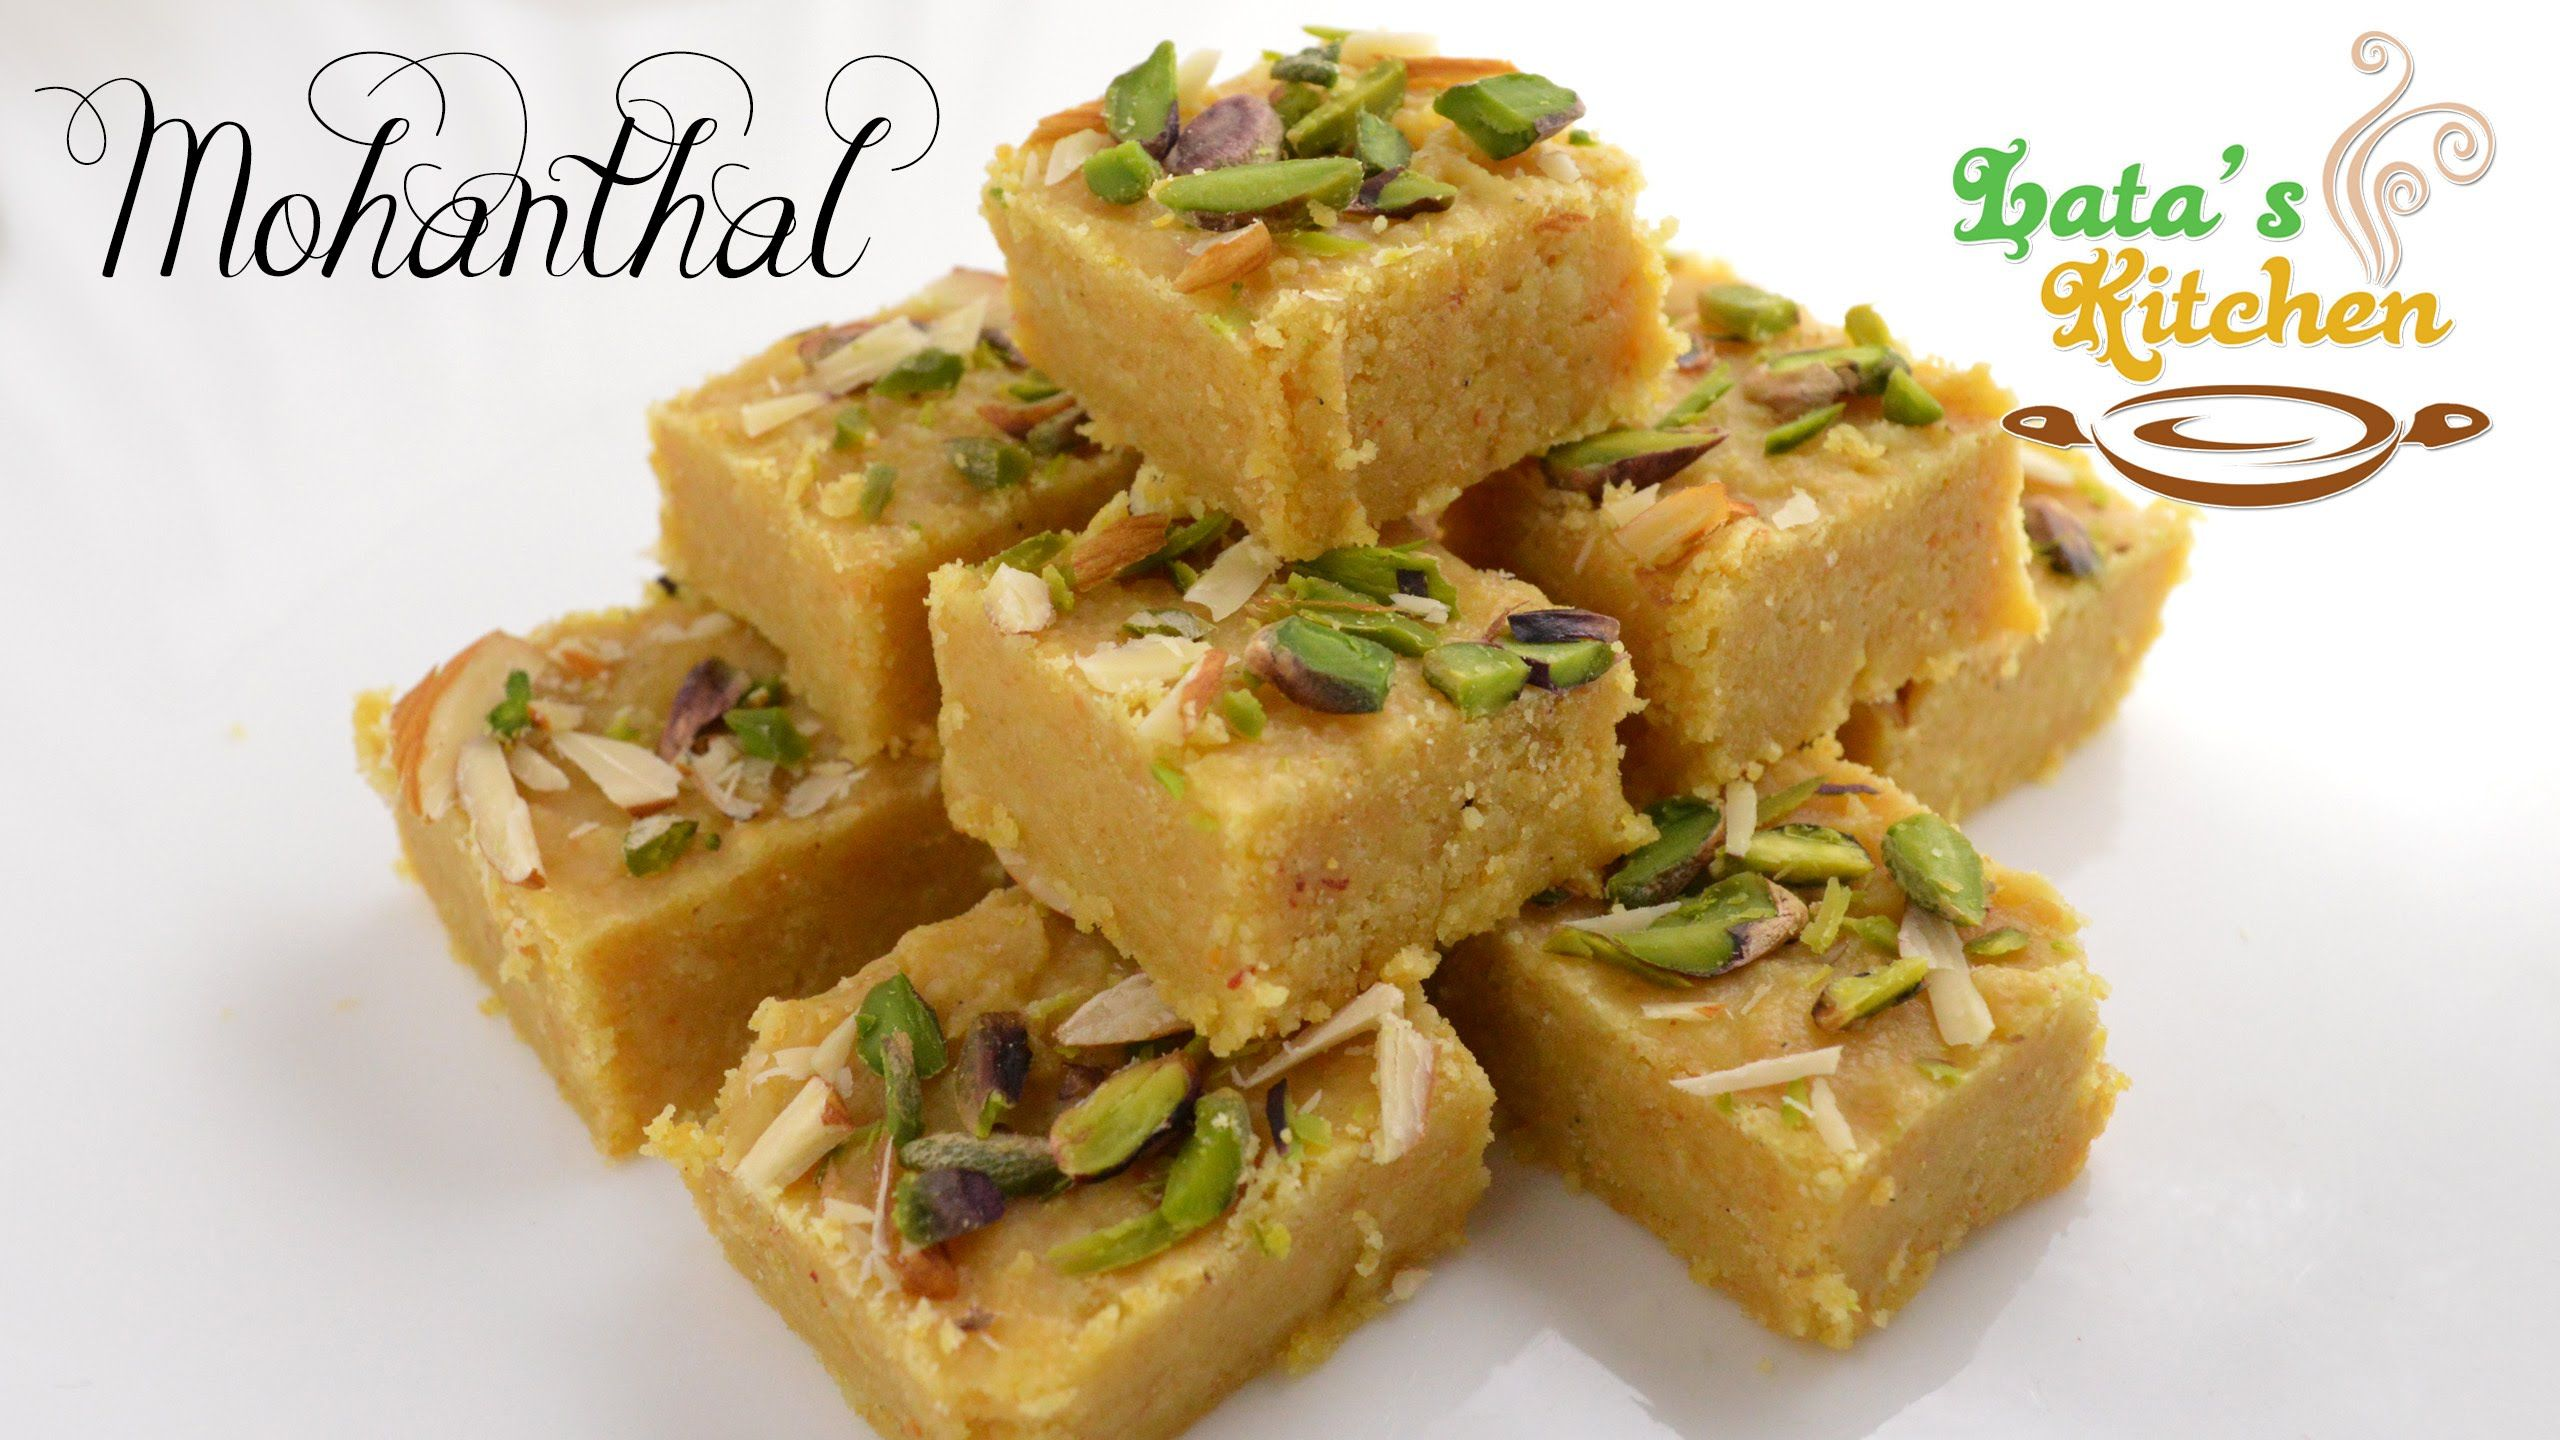 Mohanthal Recipe Video — Gujarati Indian Vegetarian Fudge